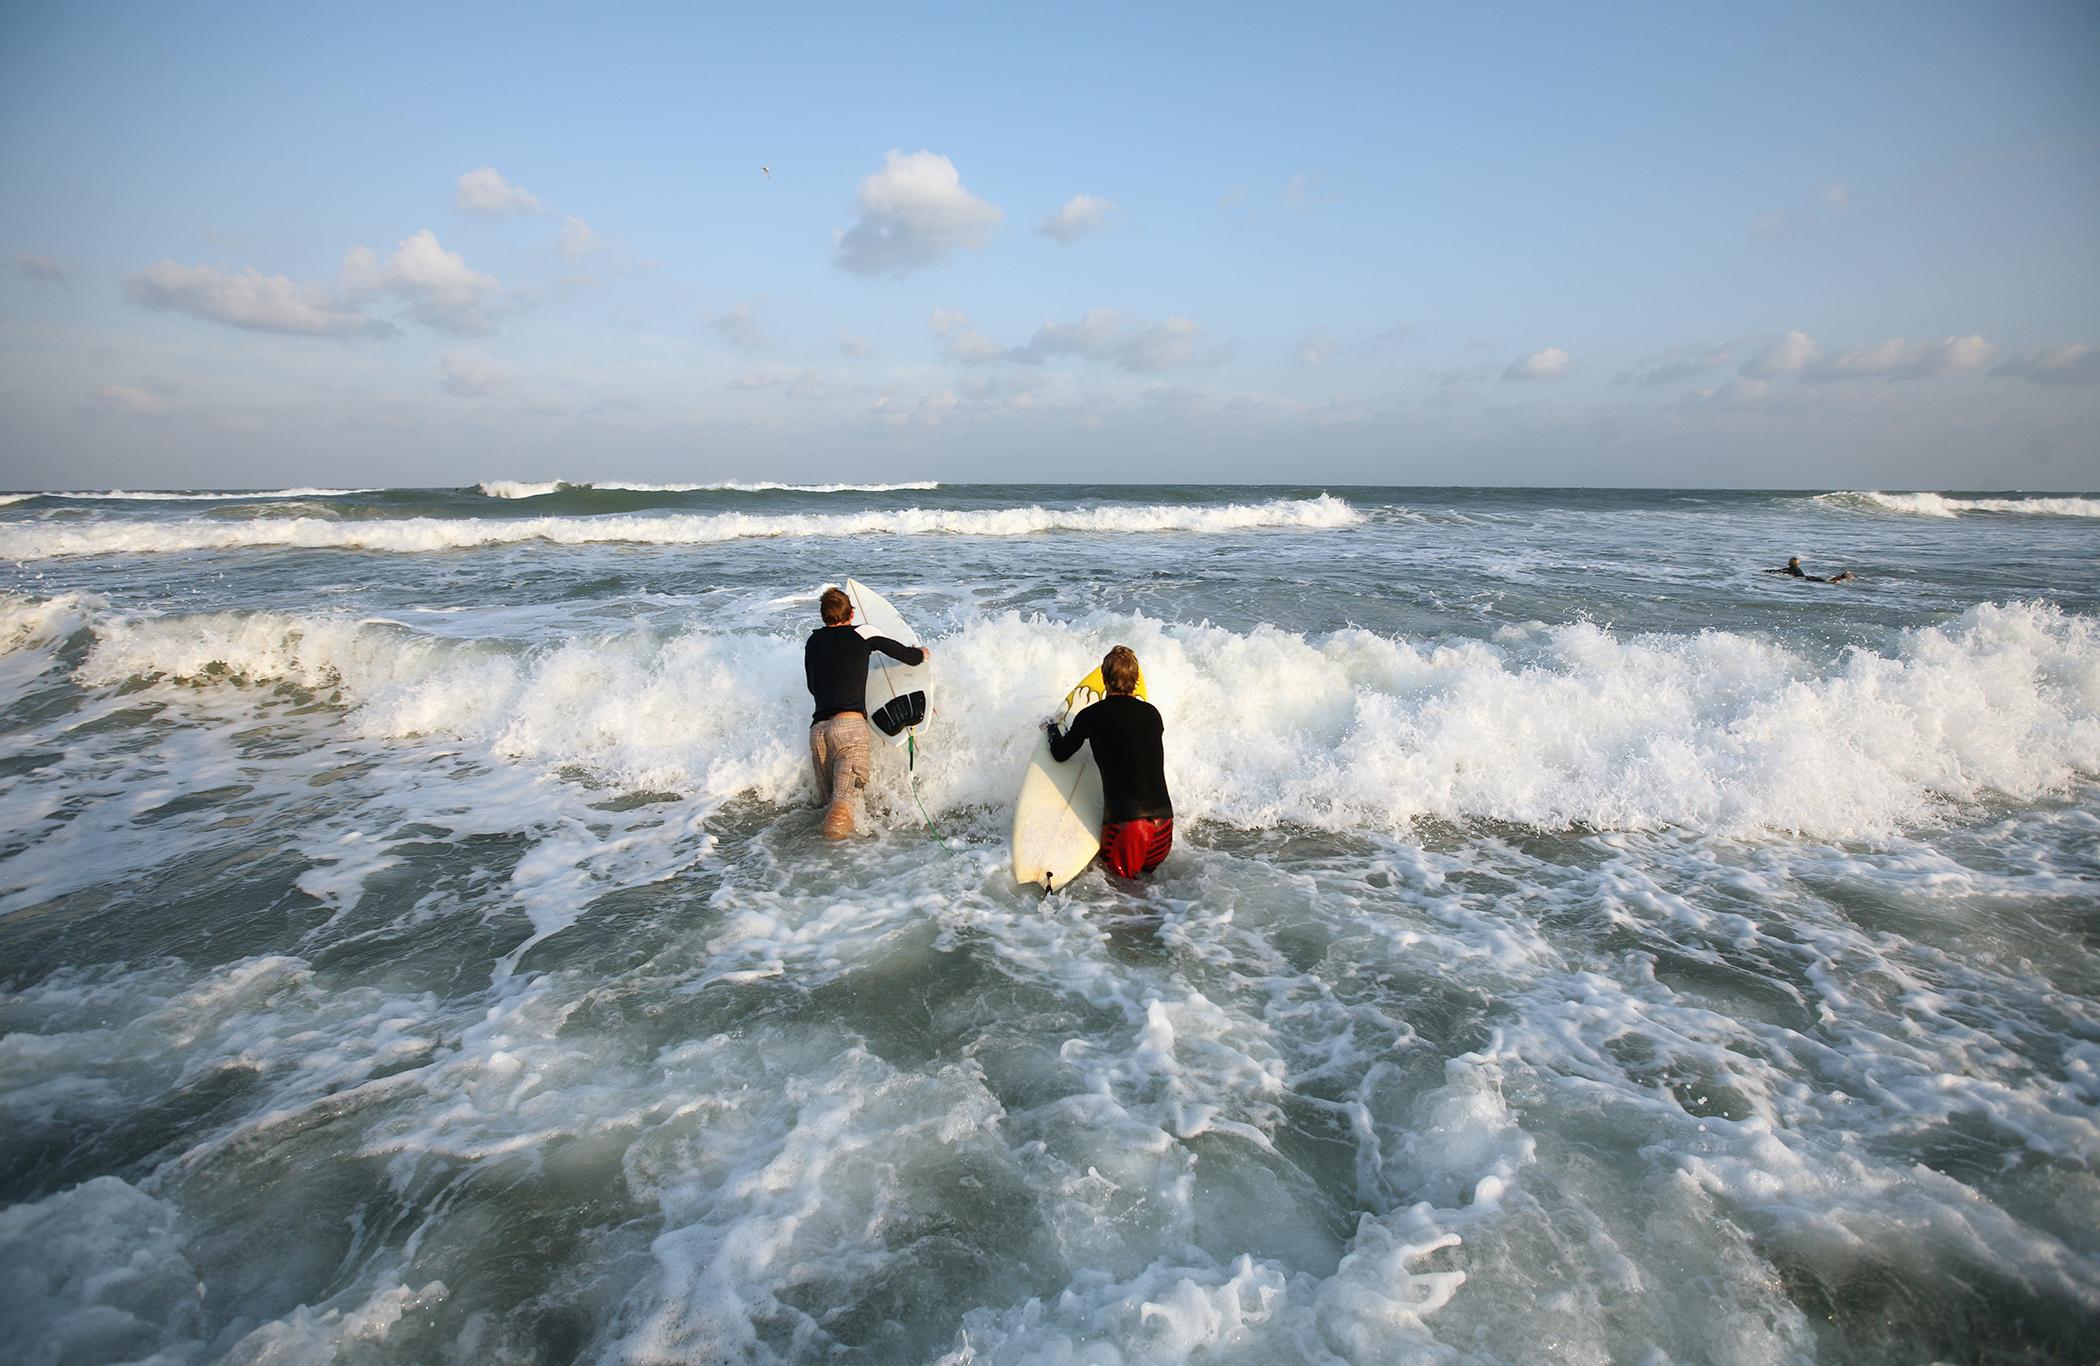 Best Colleges Near the Ocean: Warm Weather, Beaches & Books | Money